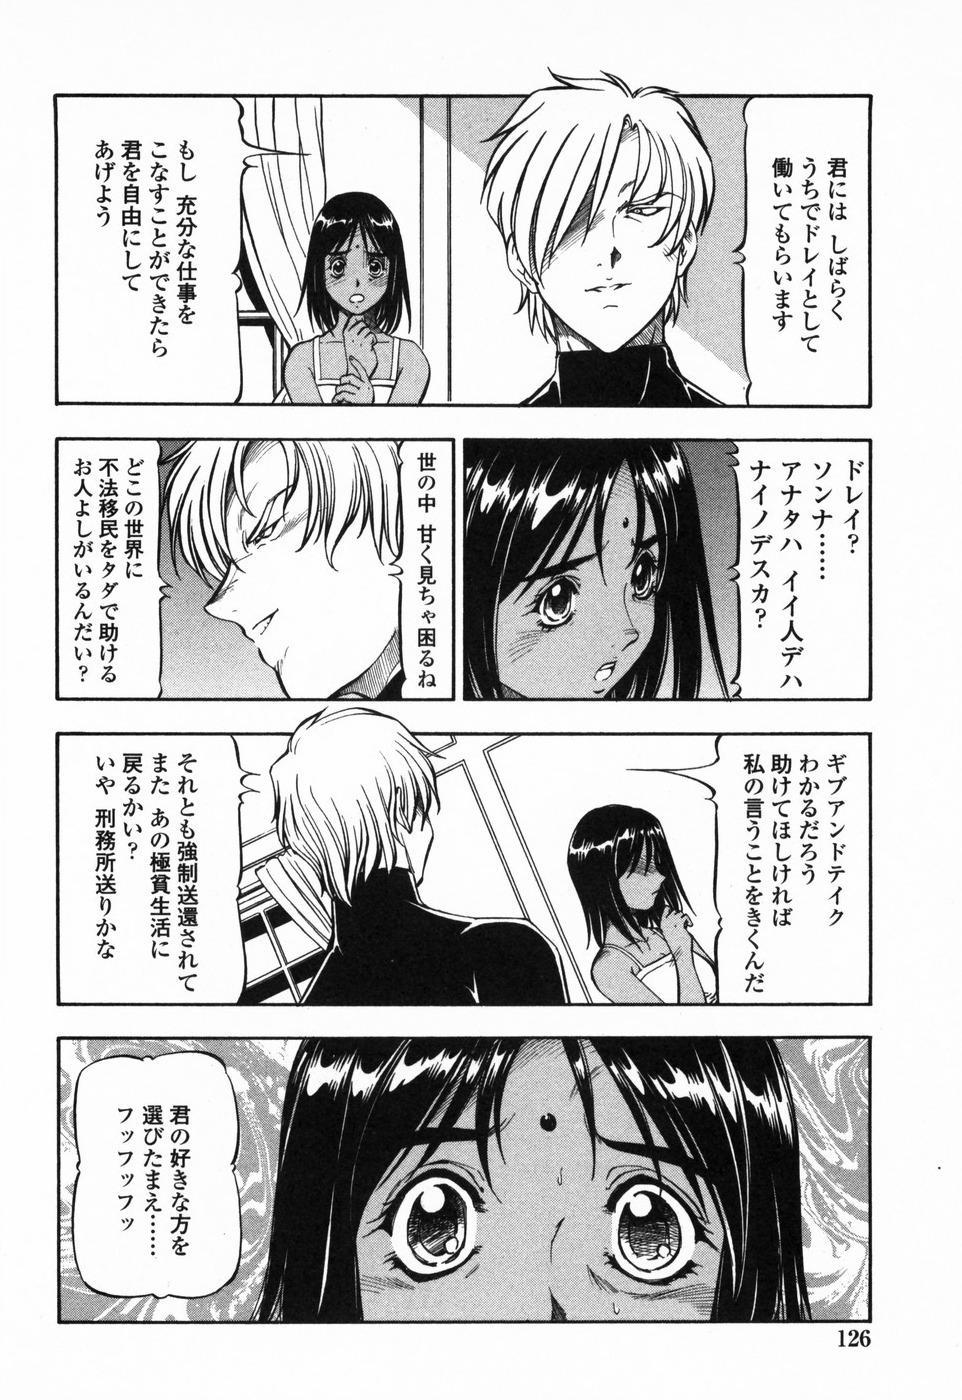 Kichiku Houteishiki - Equation of brutal person 132